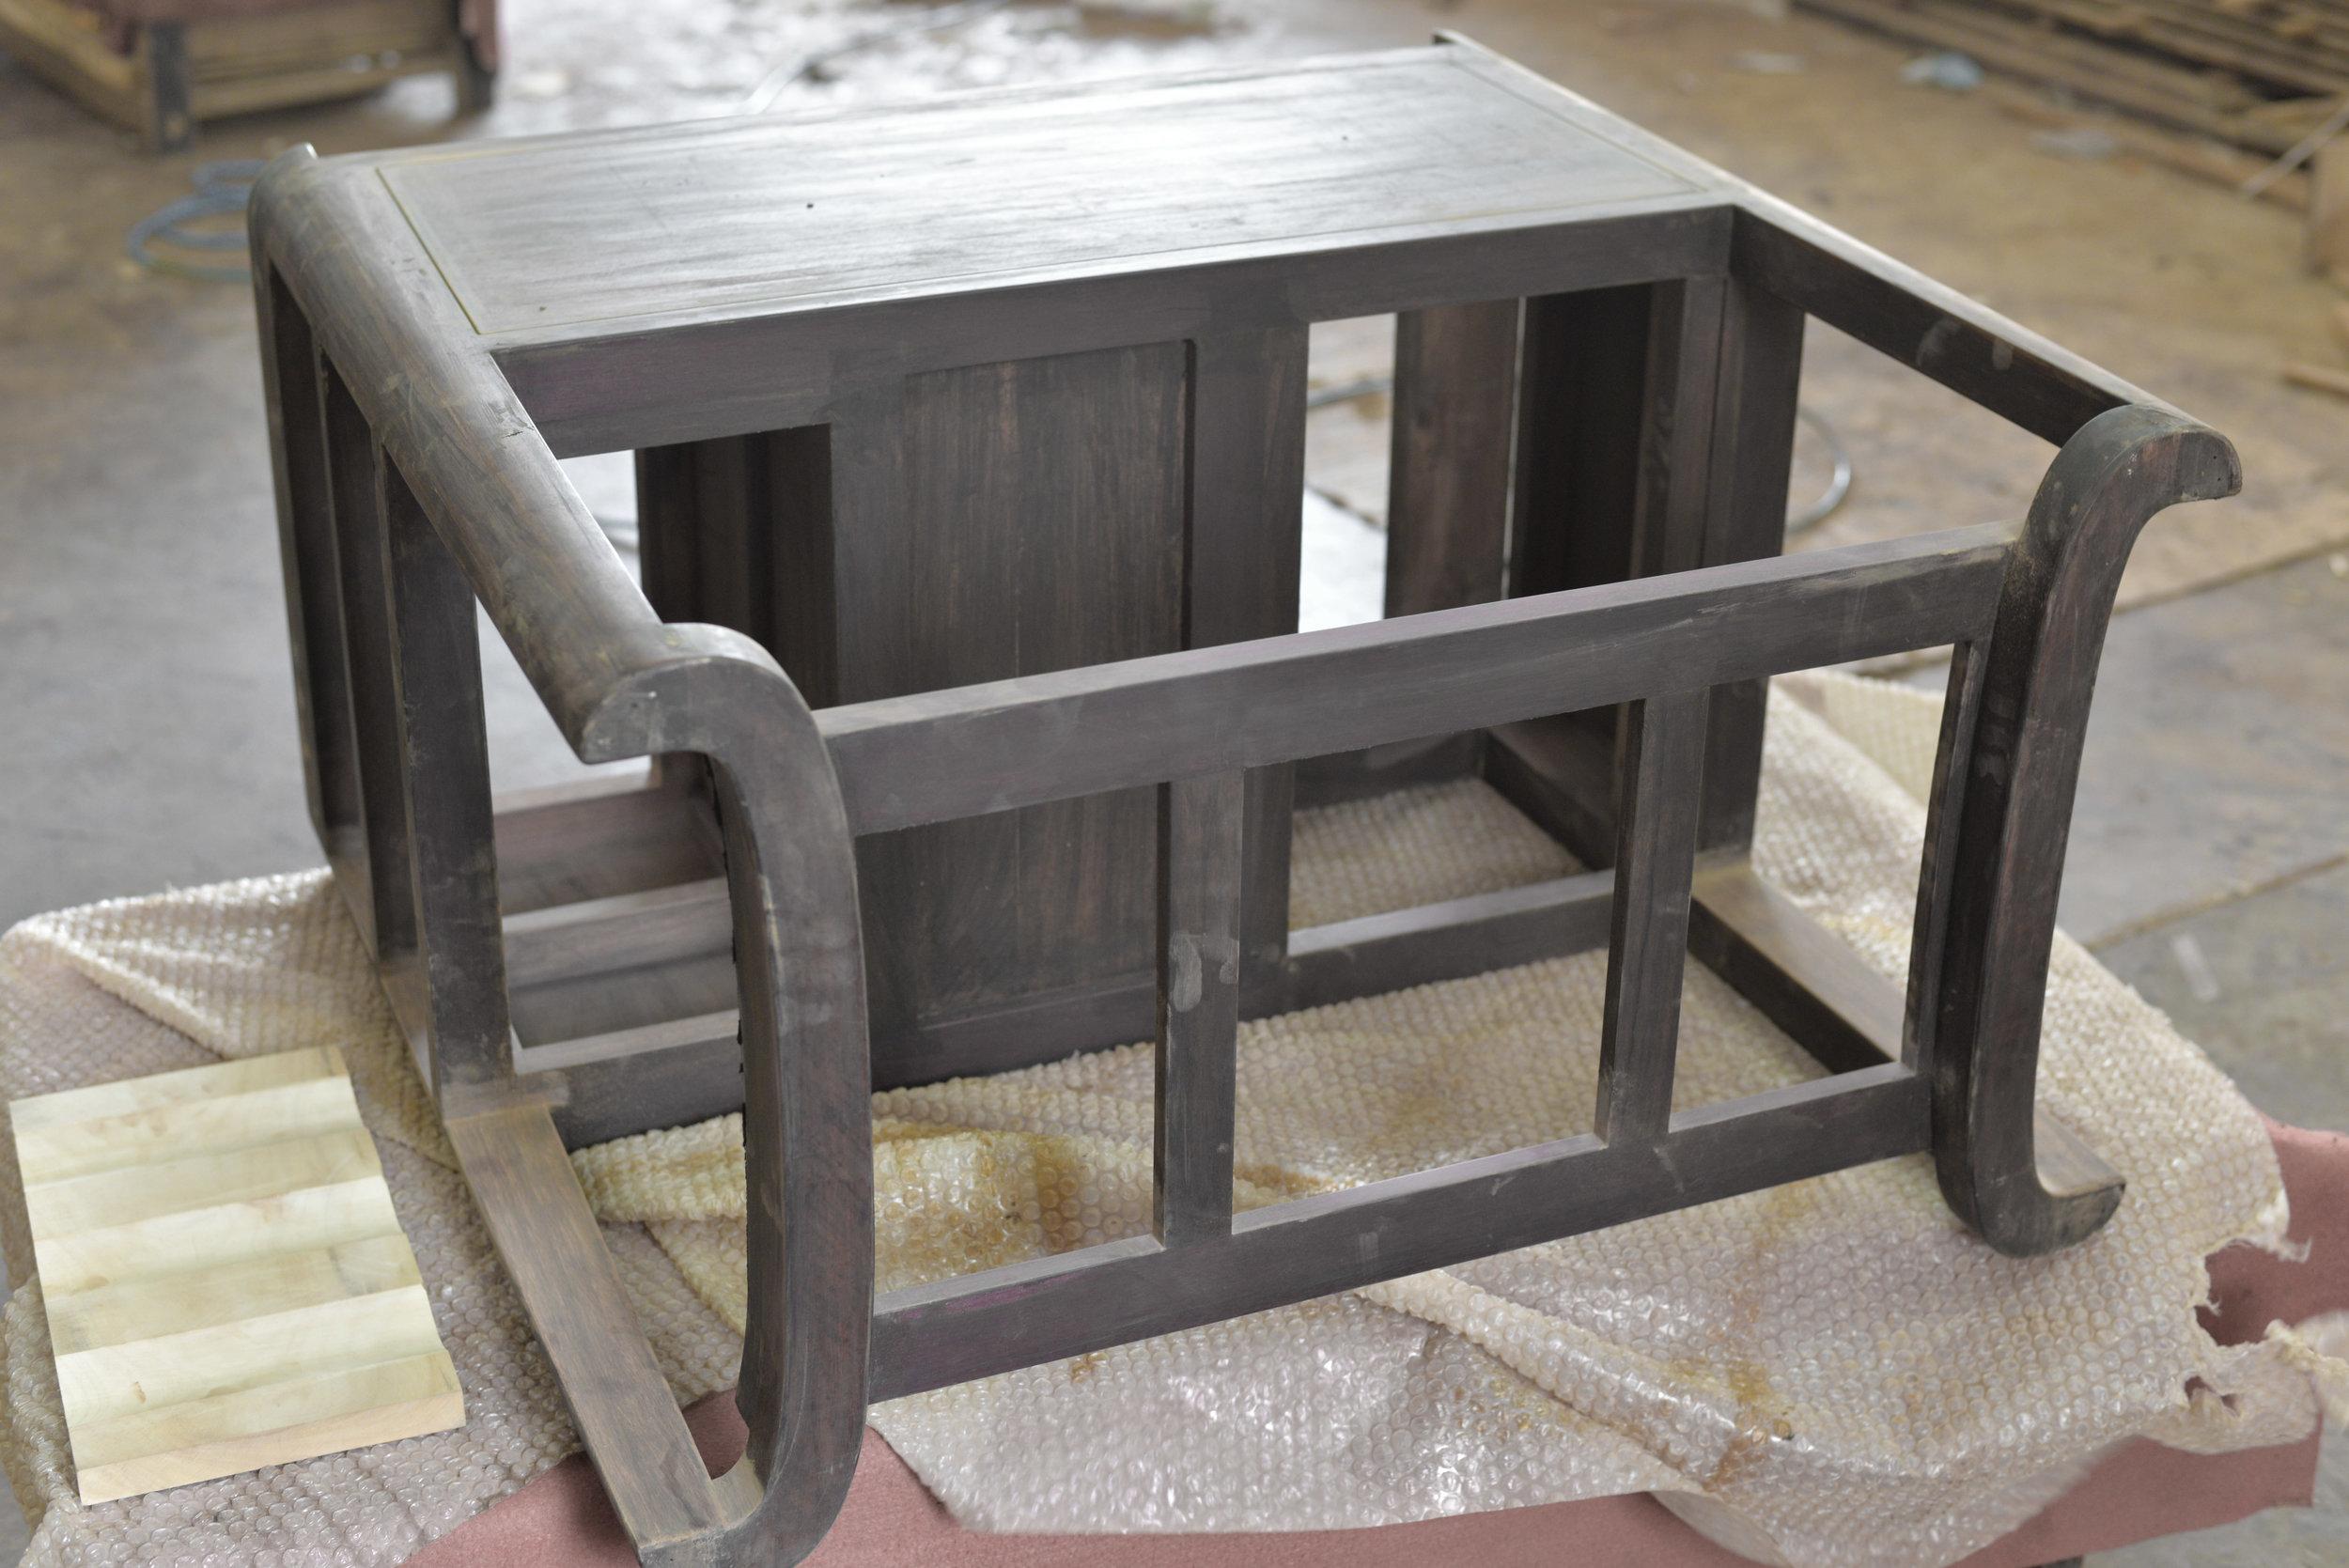 ....modern furniture | mandarin oriental tea art trolley crafting photo..现代家具 | 文华东方茶艺车制作照片....